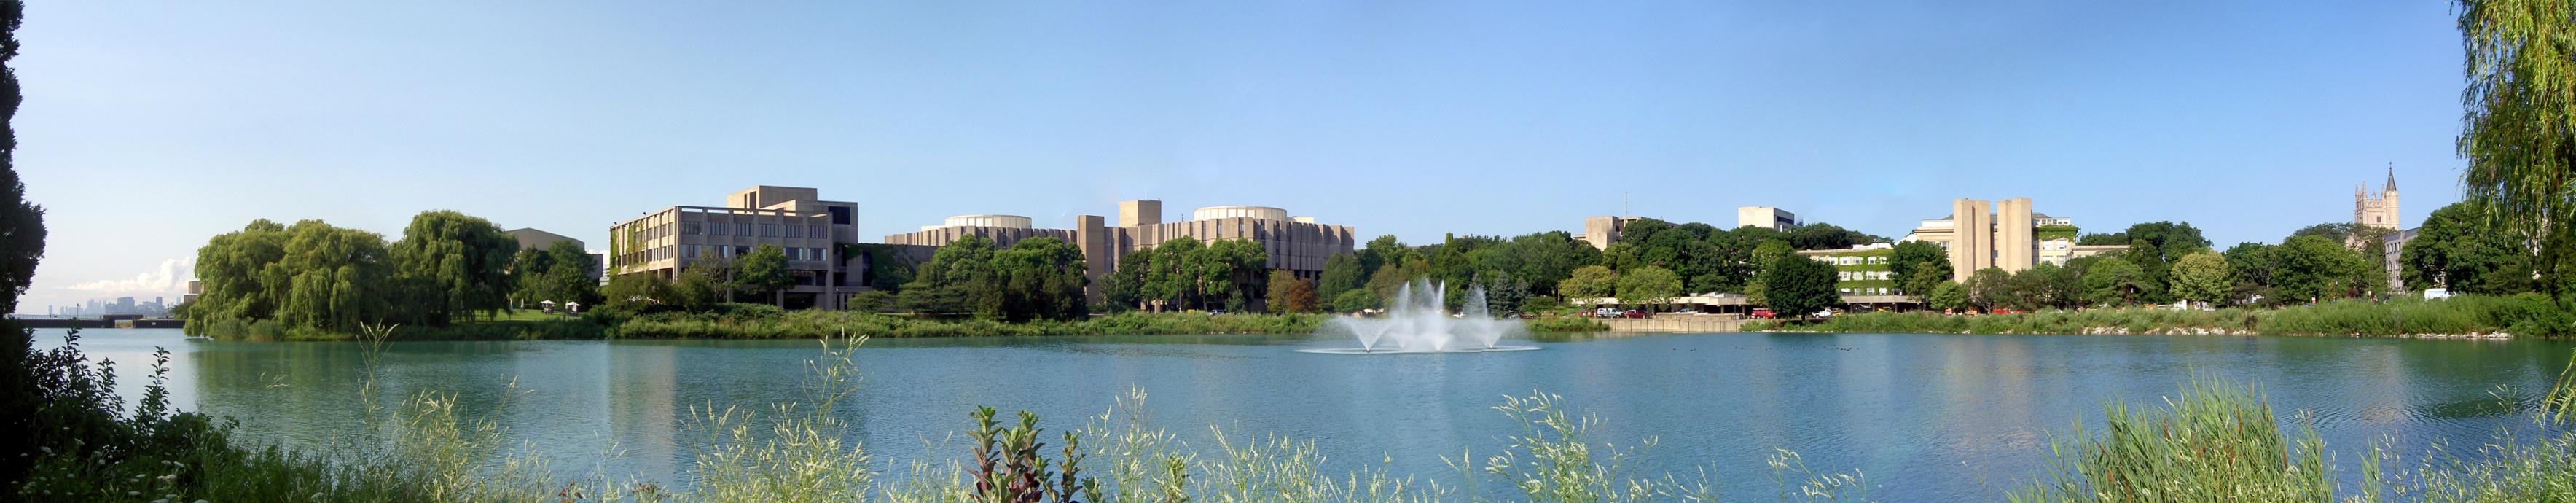 university of chicago dissertation archives